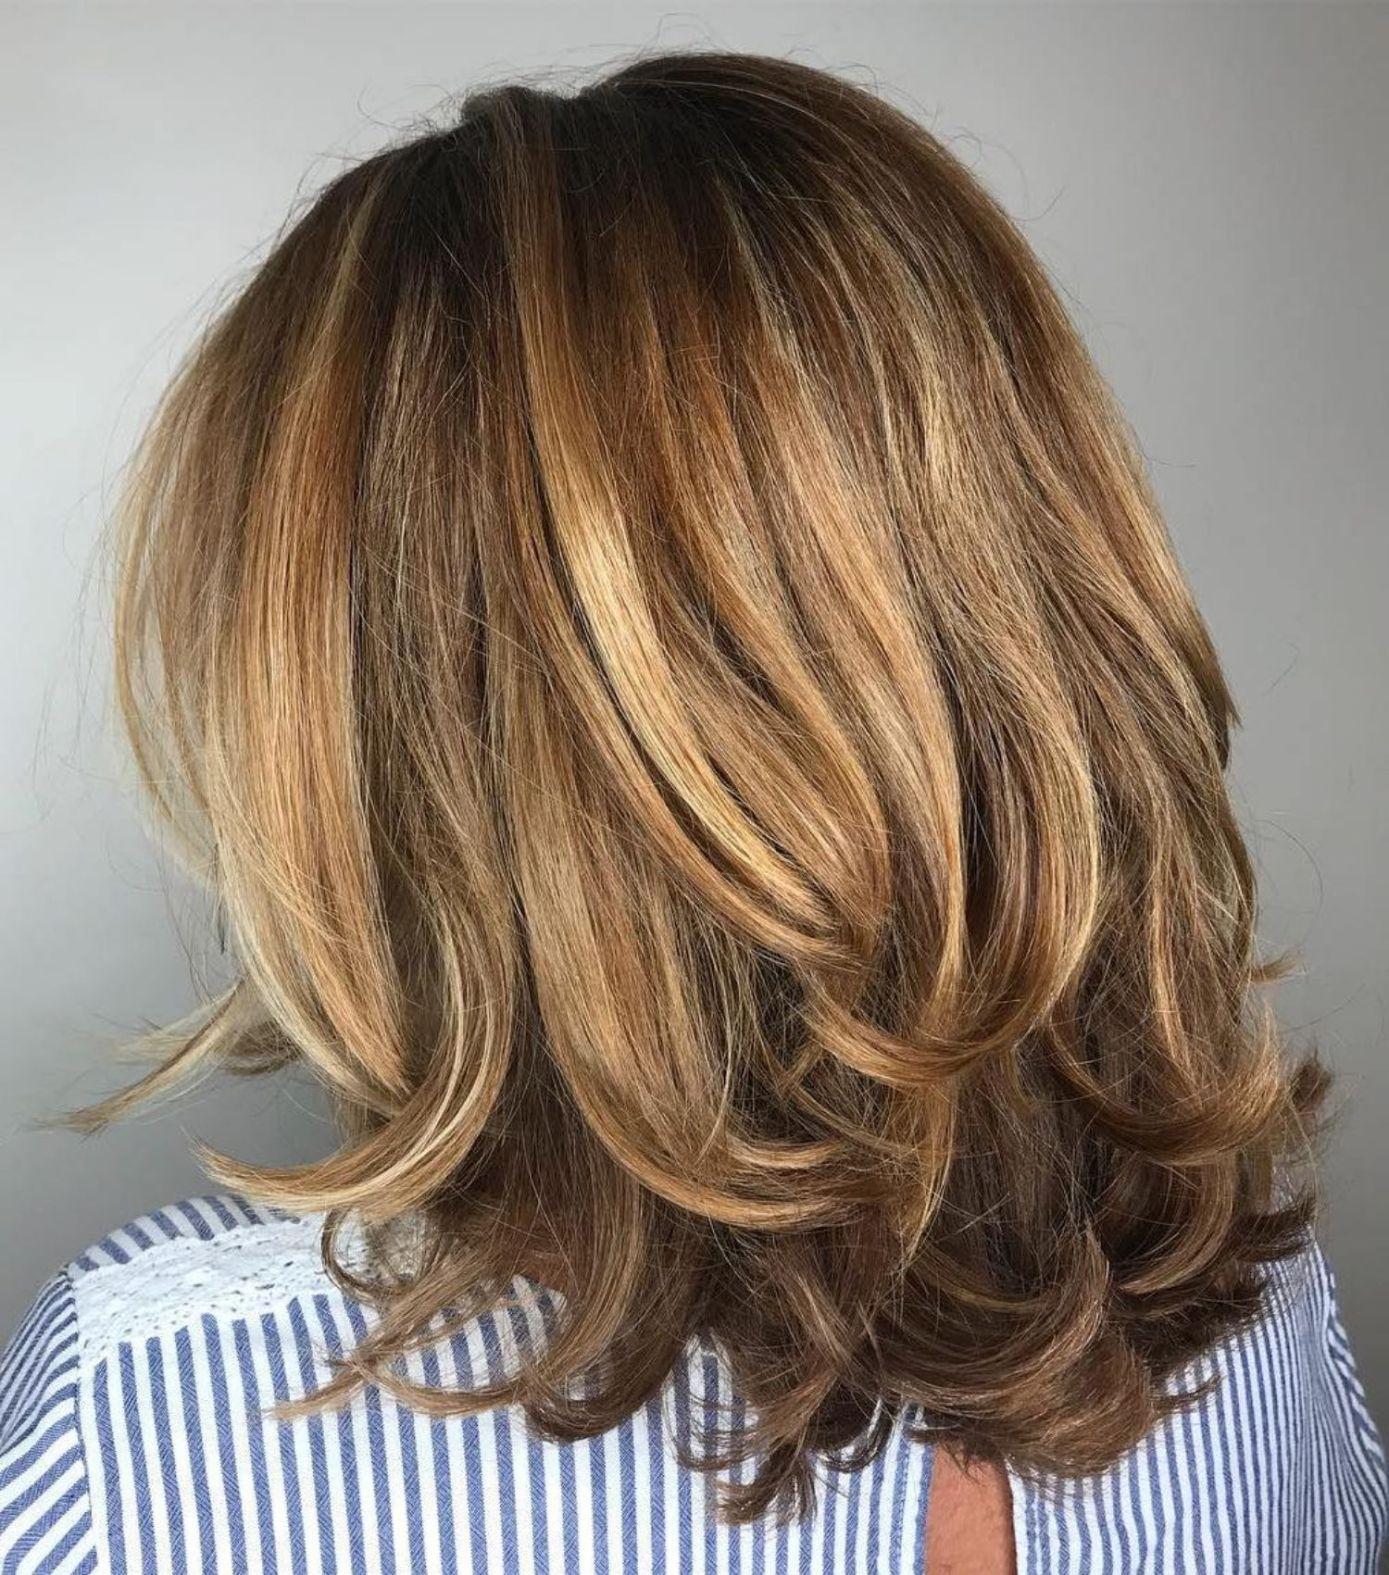 Medium Hairstyle With Long Layers  Medium hair styles, Hair